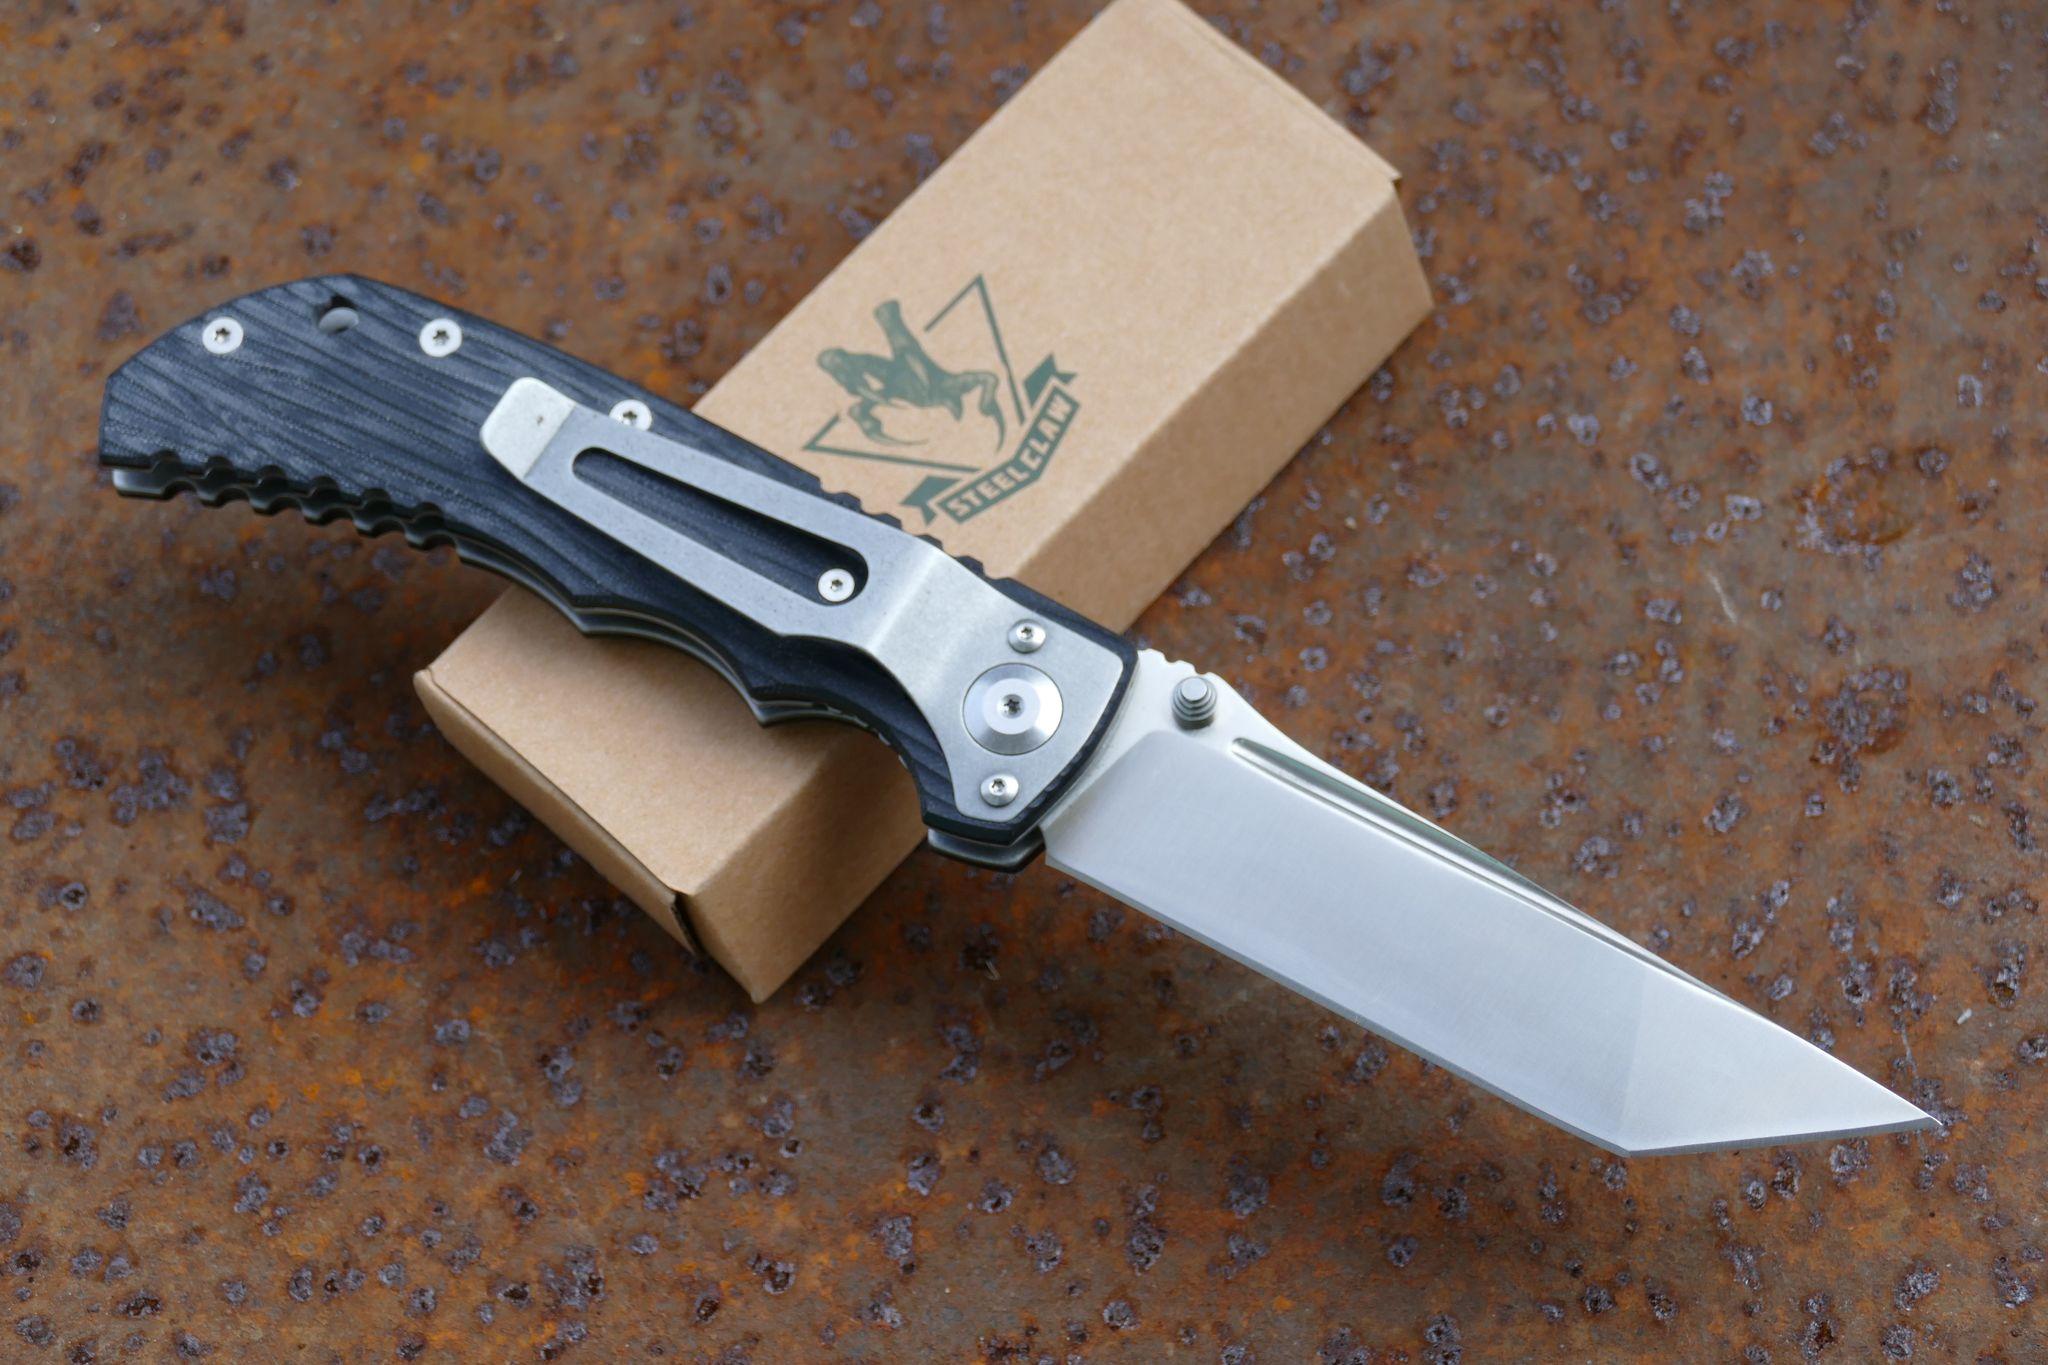 Фото 7 - Складной нож Рейнджер T6 от Steelclaw